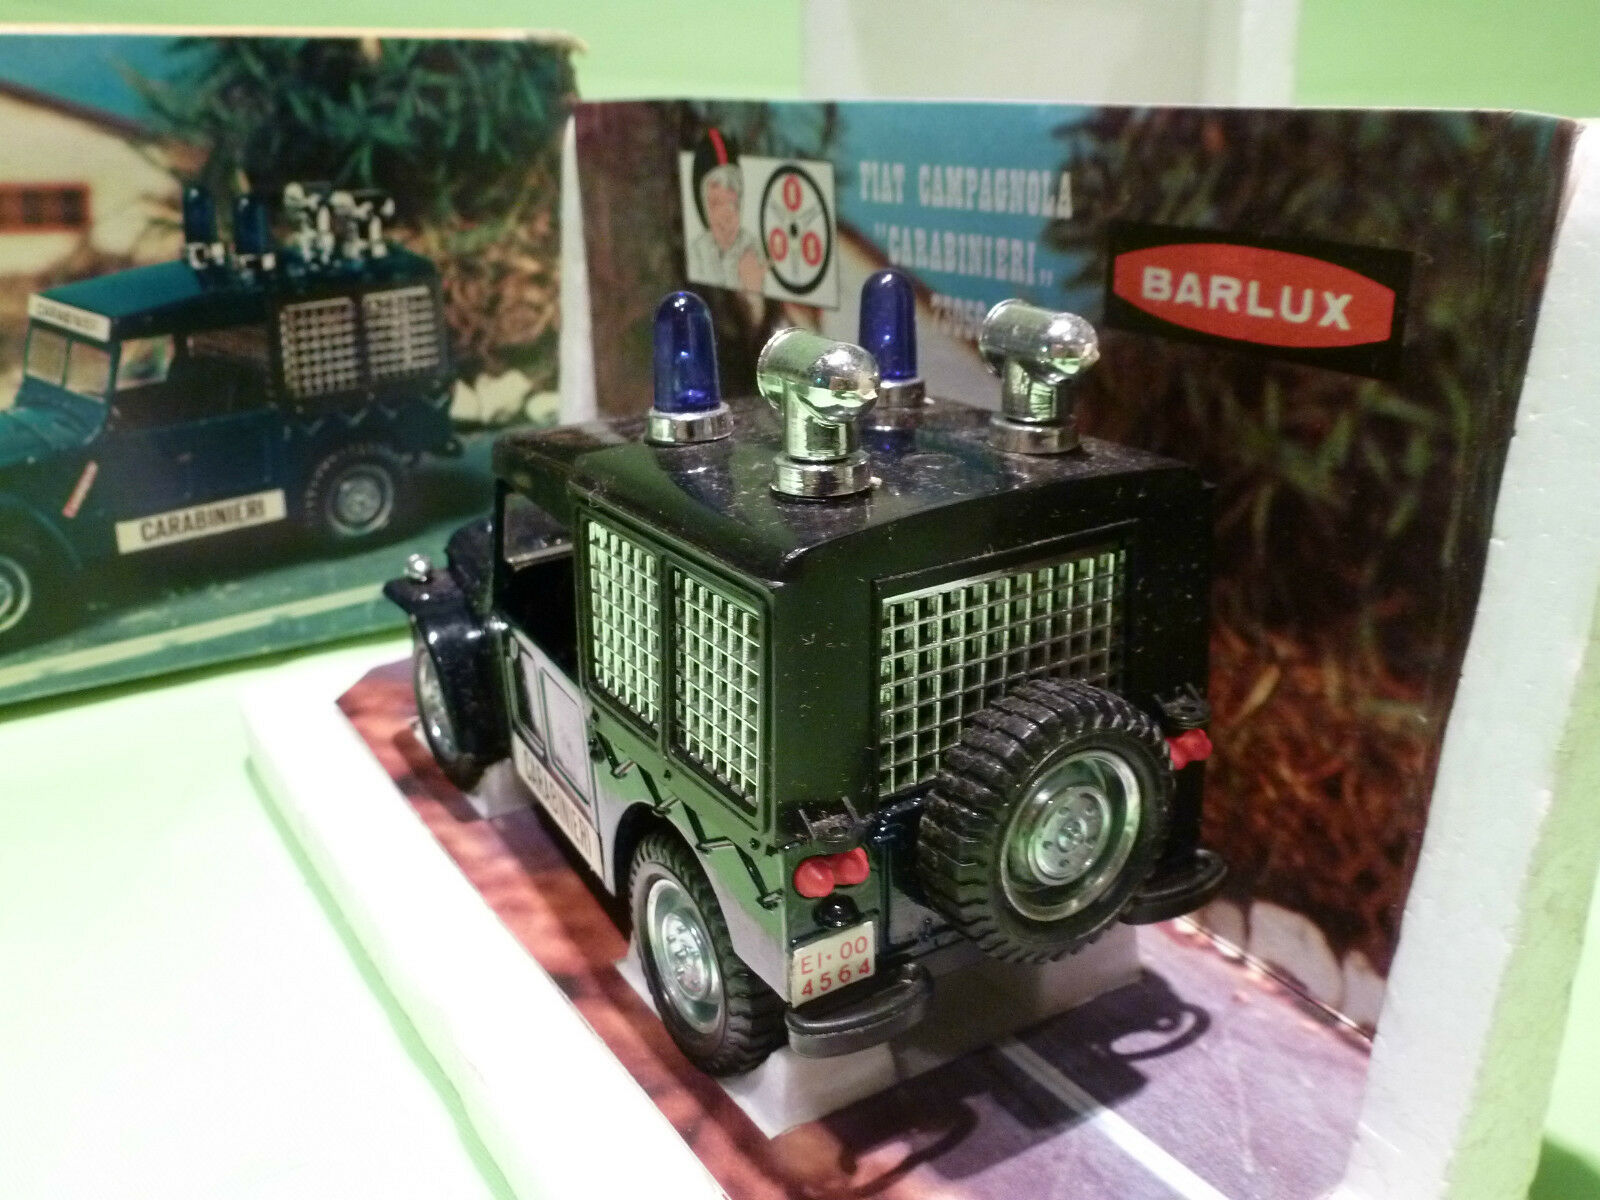 BARLUX 73056 FIAT CAMPAGNOLA CARABINIERI - - - 1 25 - RARE SELTEN - EXCELLENT IN BOX 0c7b4b